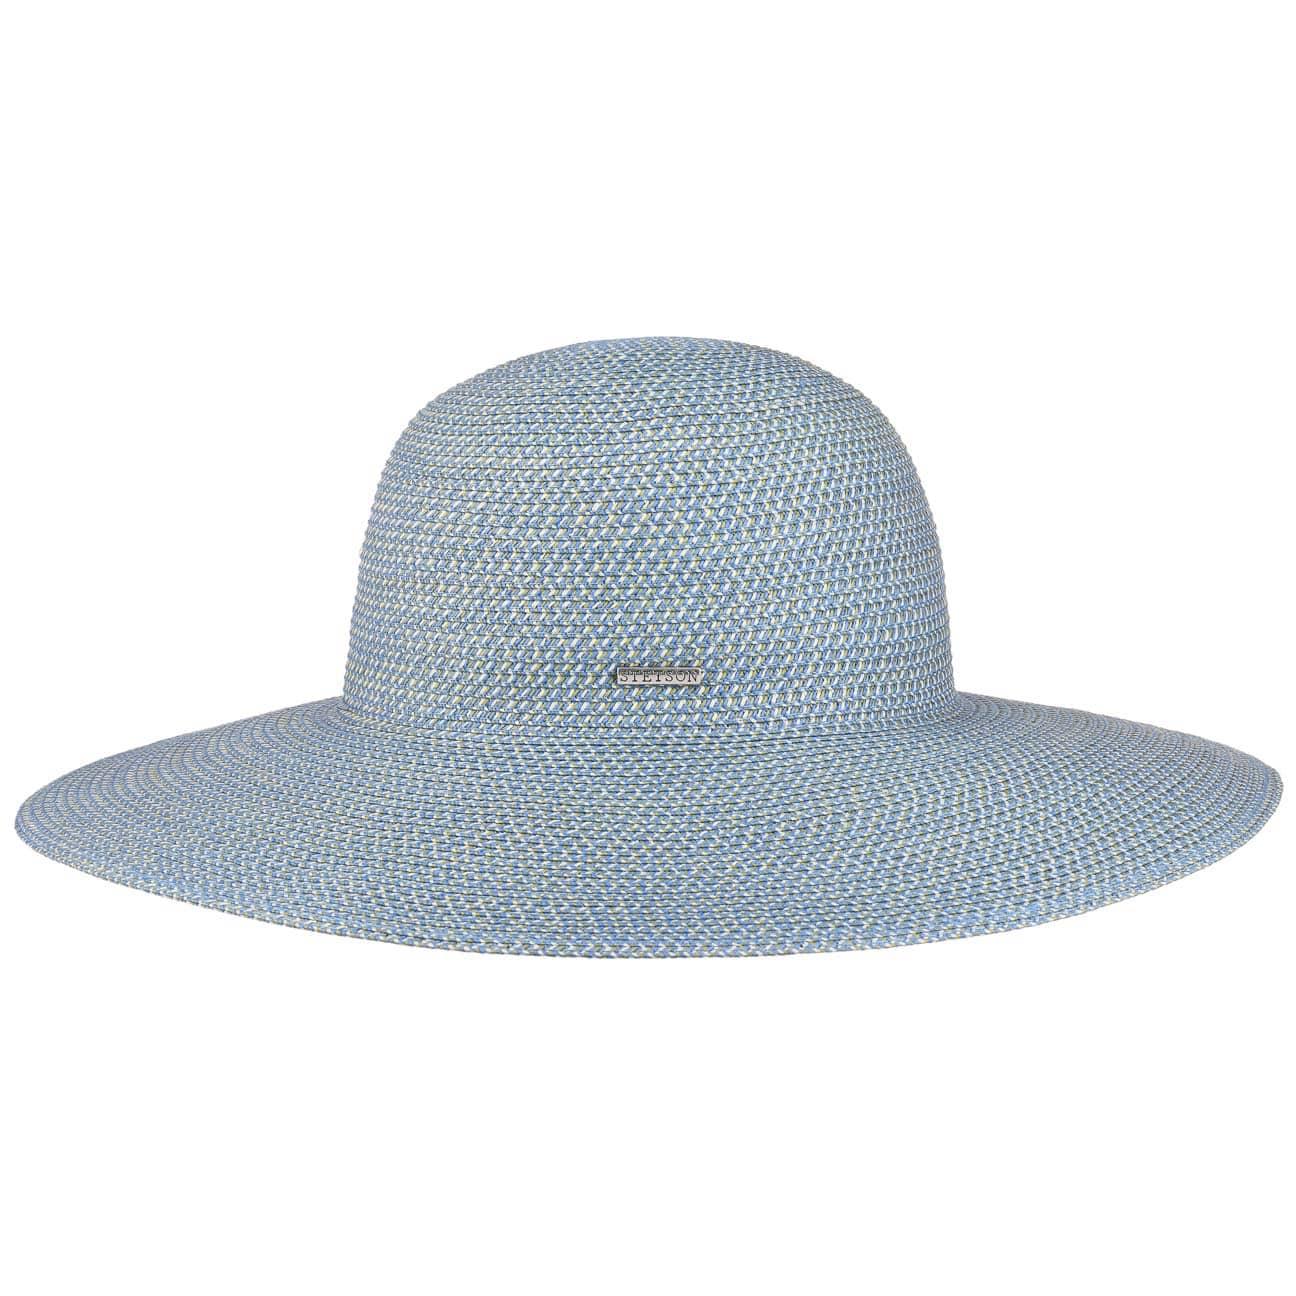 Sombrero ad Ala Ancha Toyo by Stetson  sombrero ala ancha